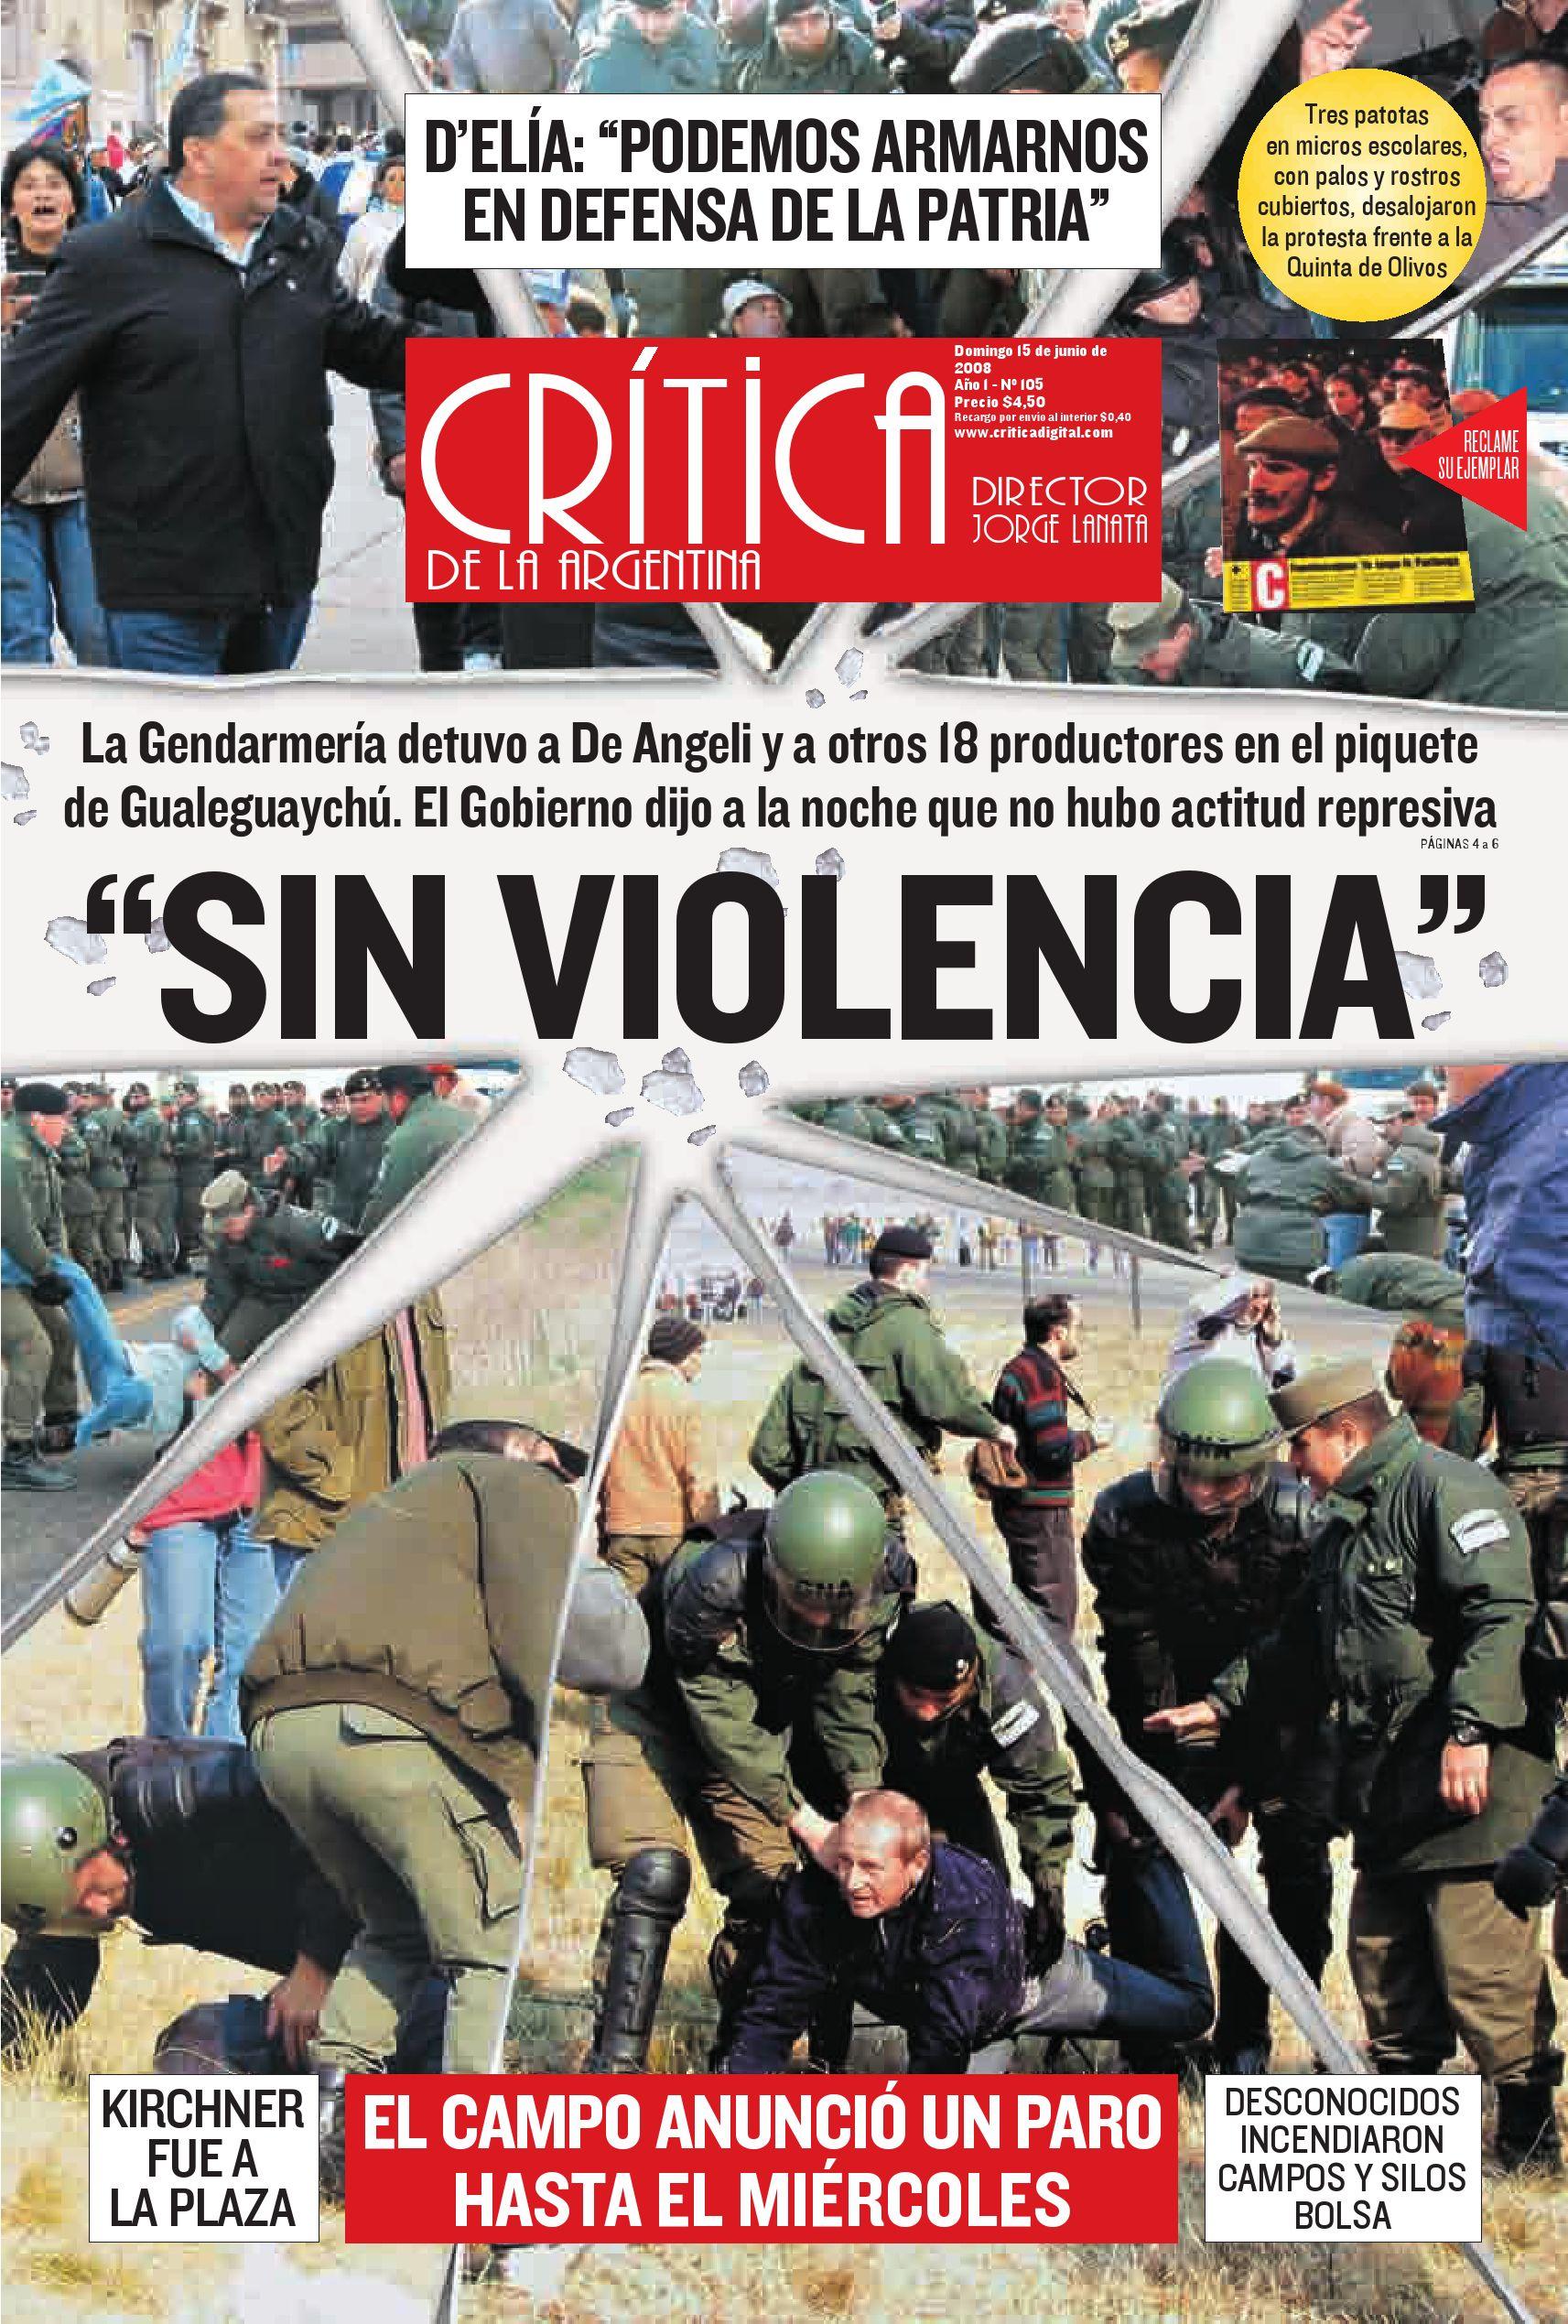 Diario Critica Argentina 15 jun 2008 by Teresa Elguer - issuu 6a6234f2049